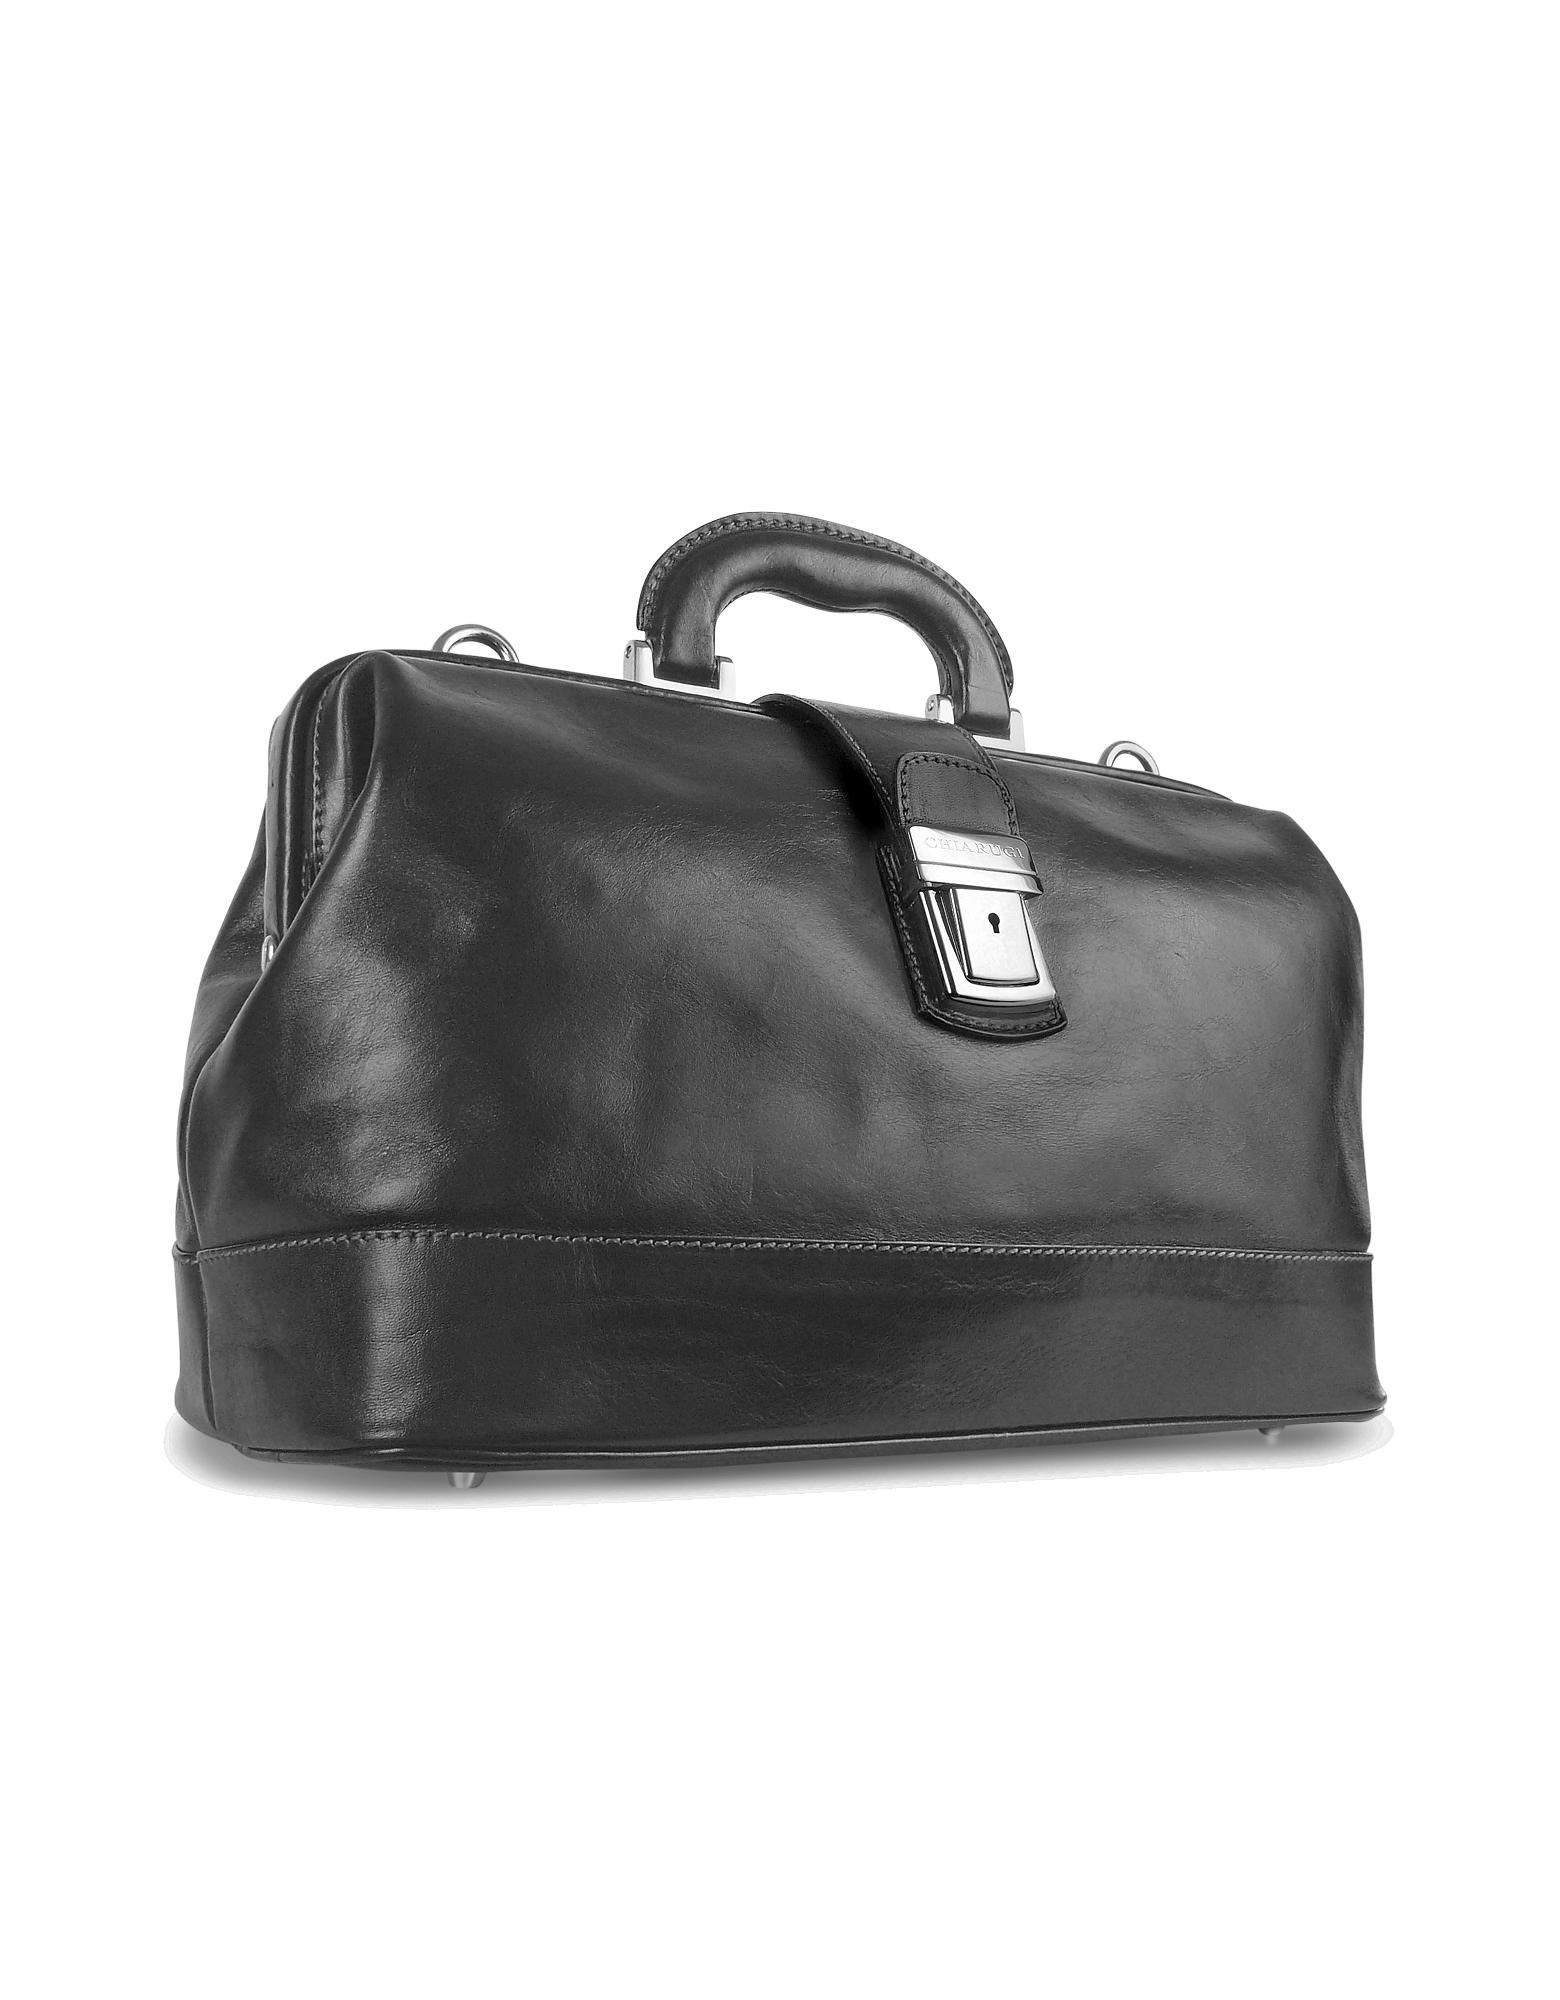 Image of Black Genuine Italian Leather Doctor Bag